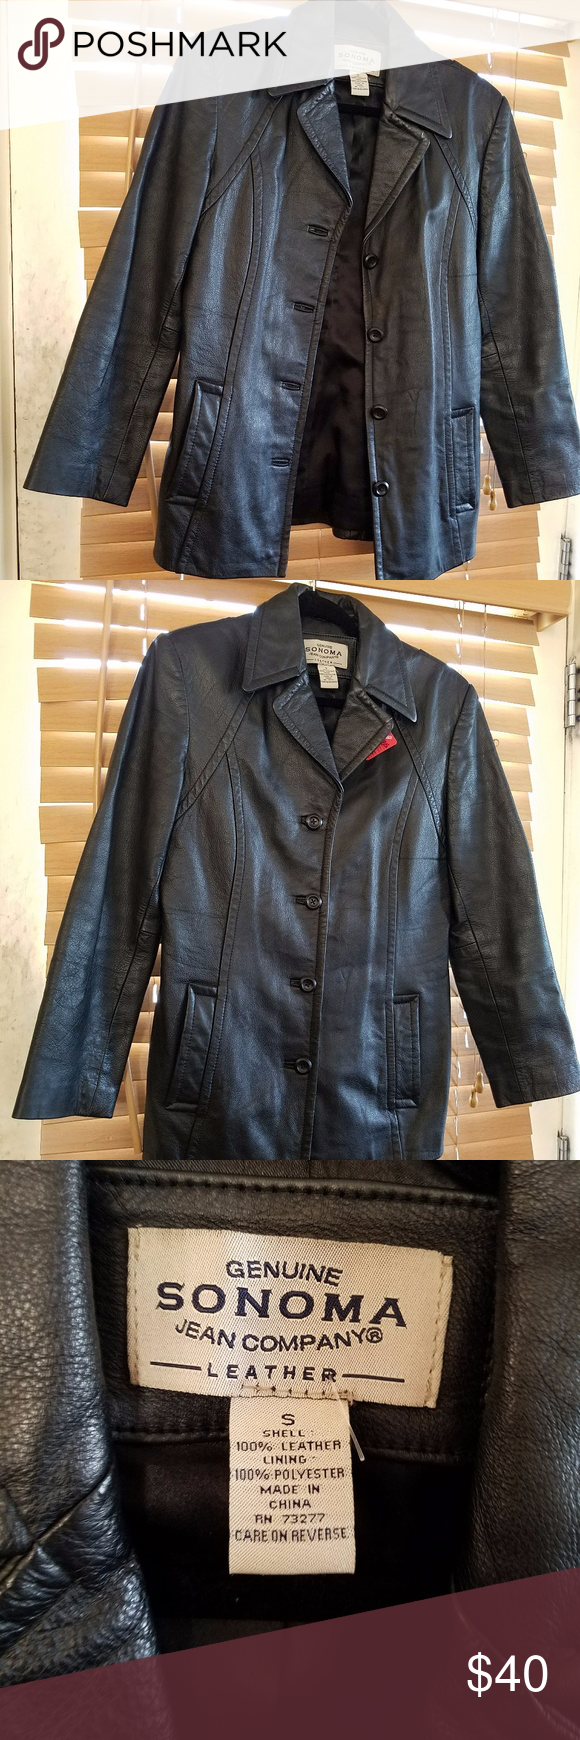 Men S Leather Kohl S Coat Jacket S Dean Winchester Sonoma Jeans Coats Jackets Leather Men [ 1740 x 580 Pixel ]